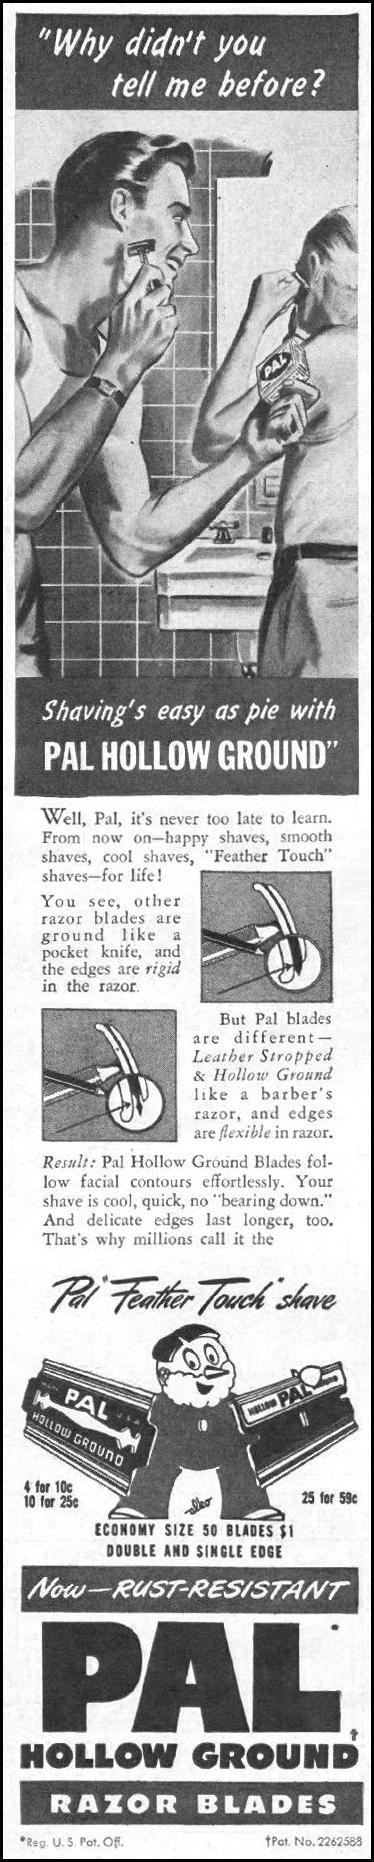 PAL HOLLOW-GROUND RAZOR BLADES LIFE 11/25/1946 p. 132